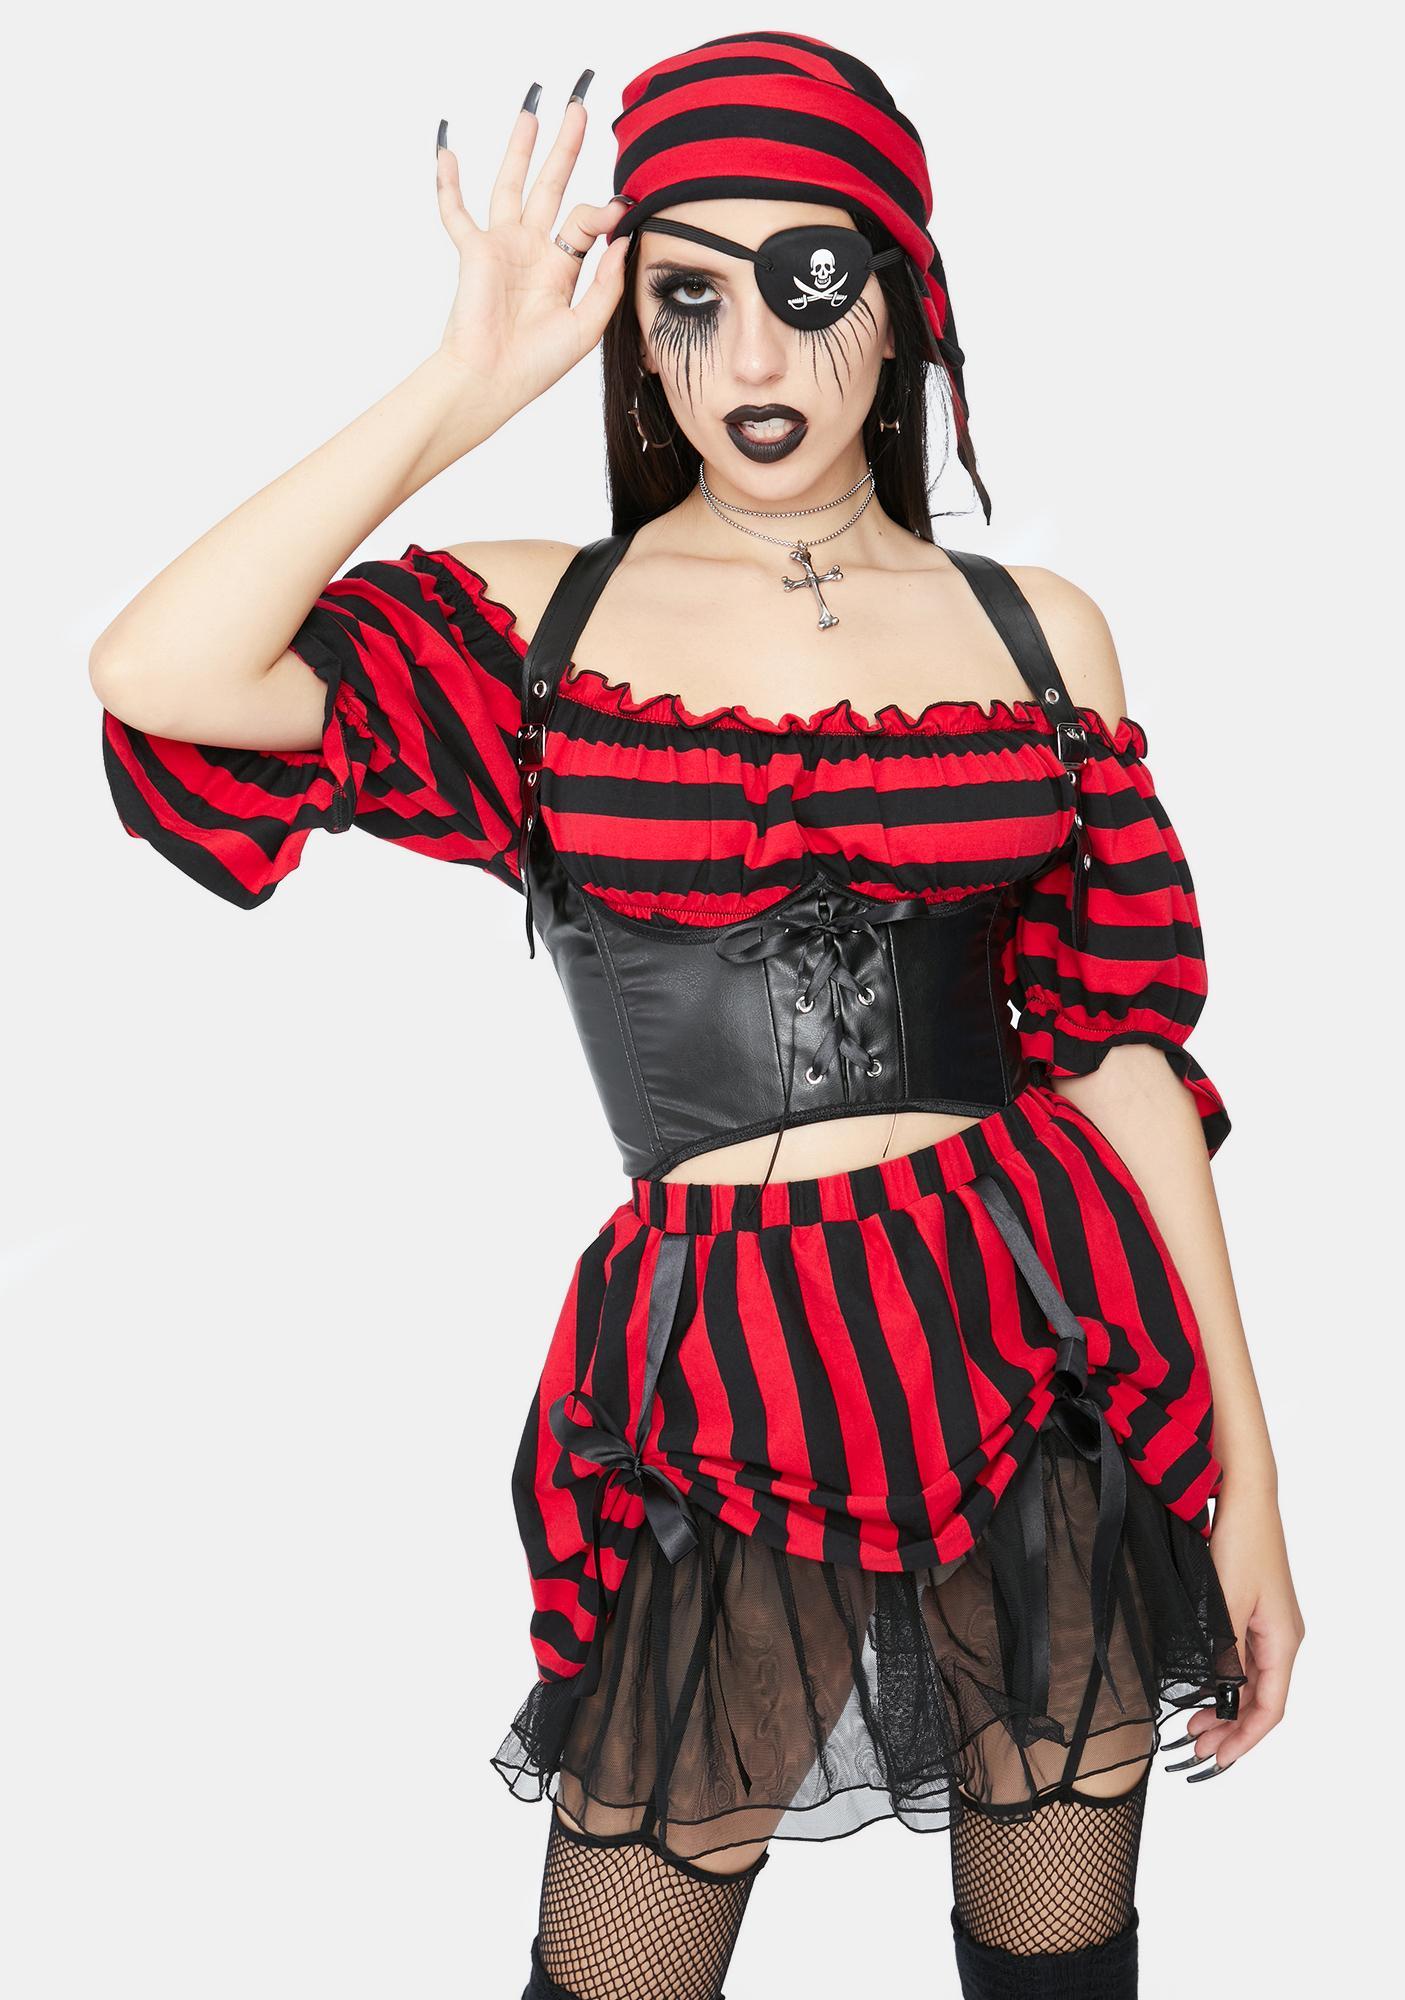 Trickz & Treatz Shiver Me Timbers Pirate Costume